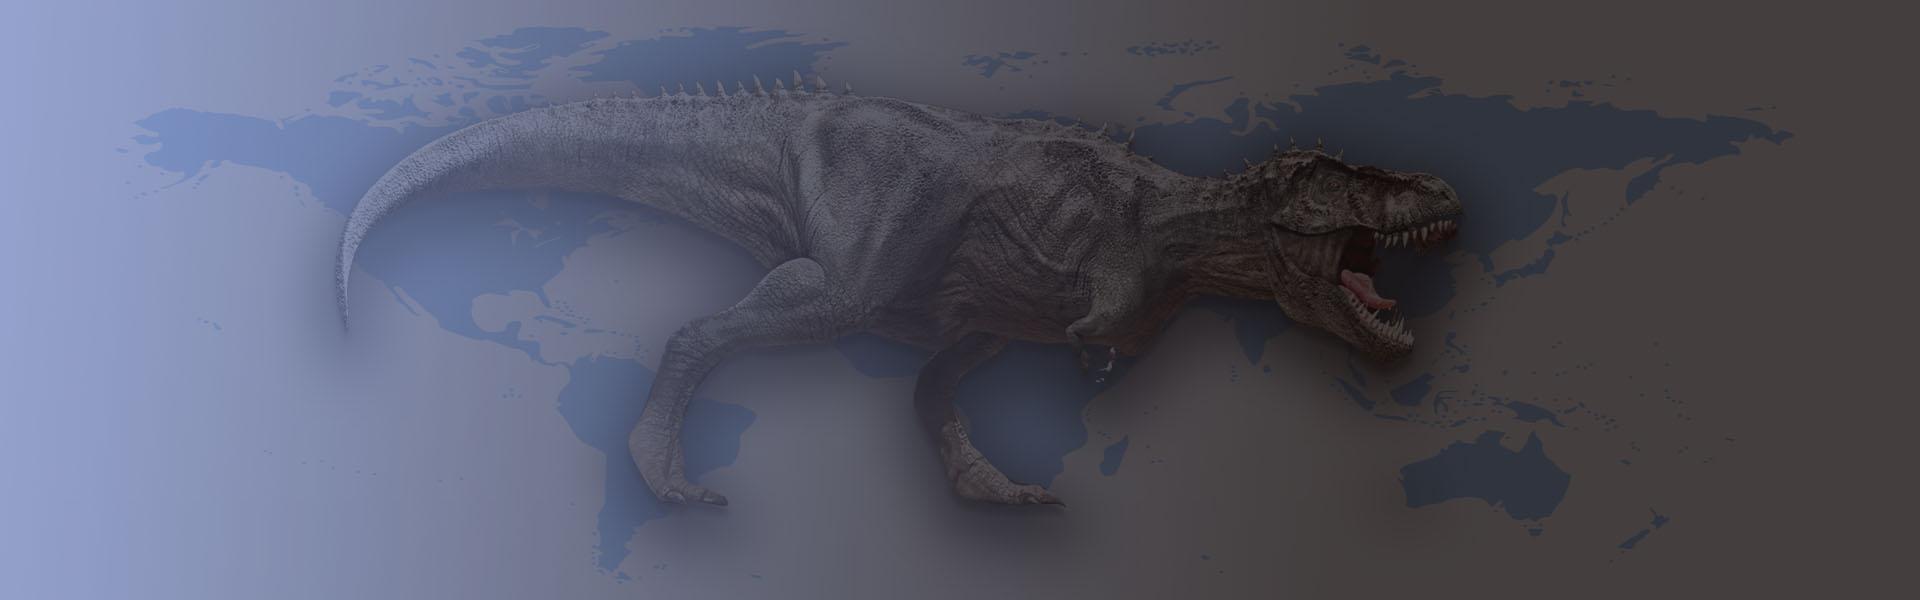 Animatronics World Projects Banner